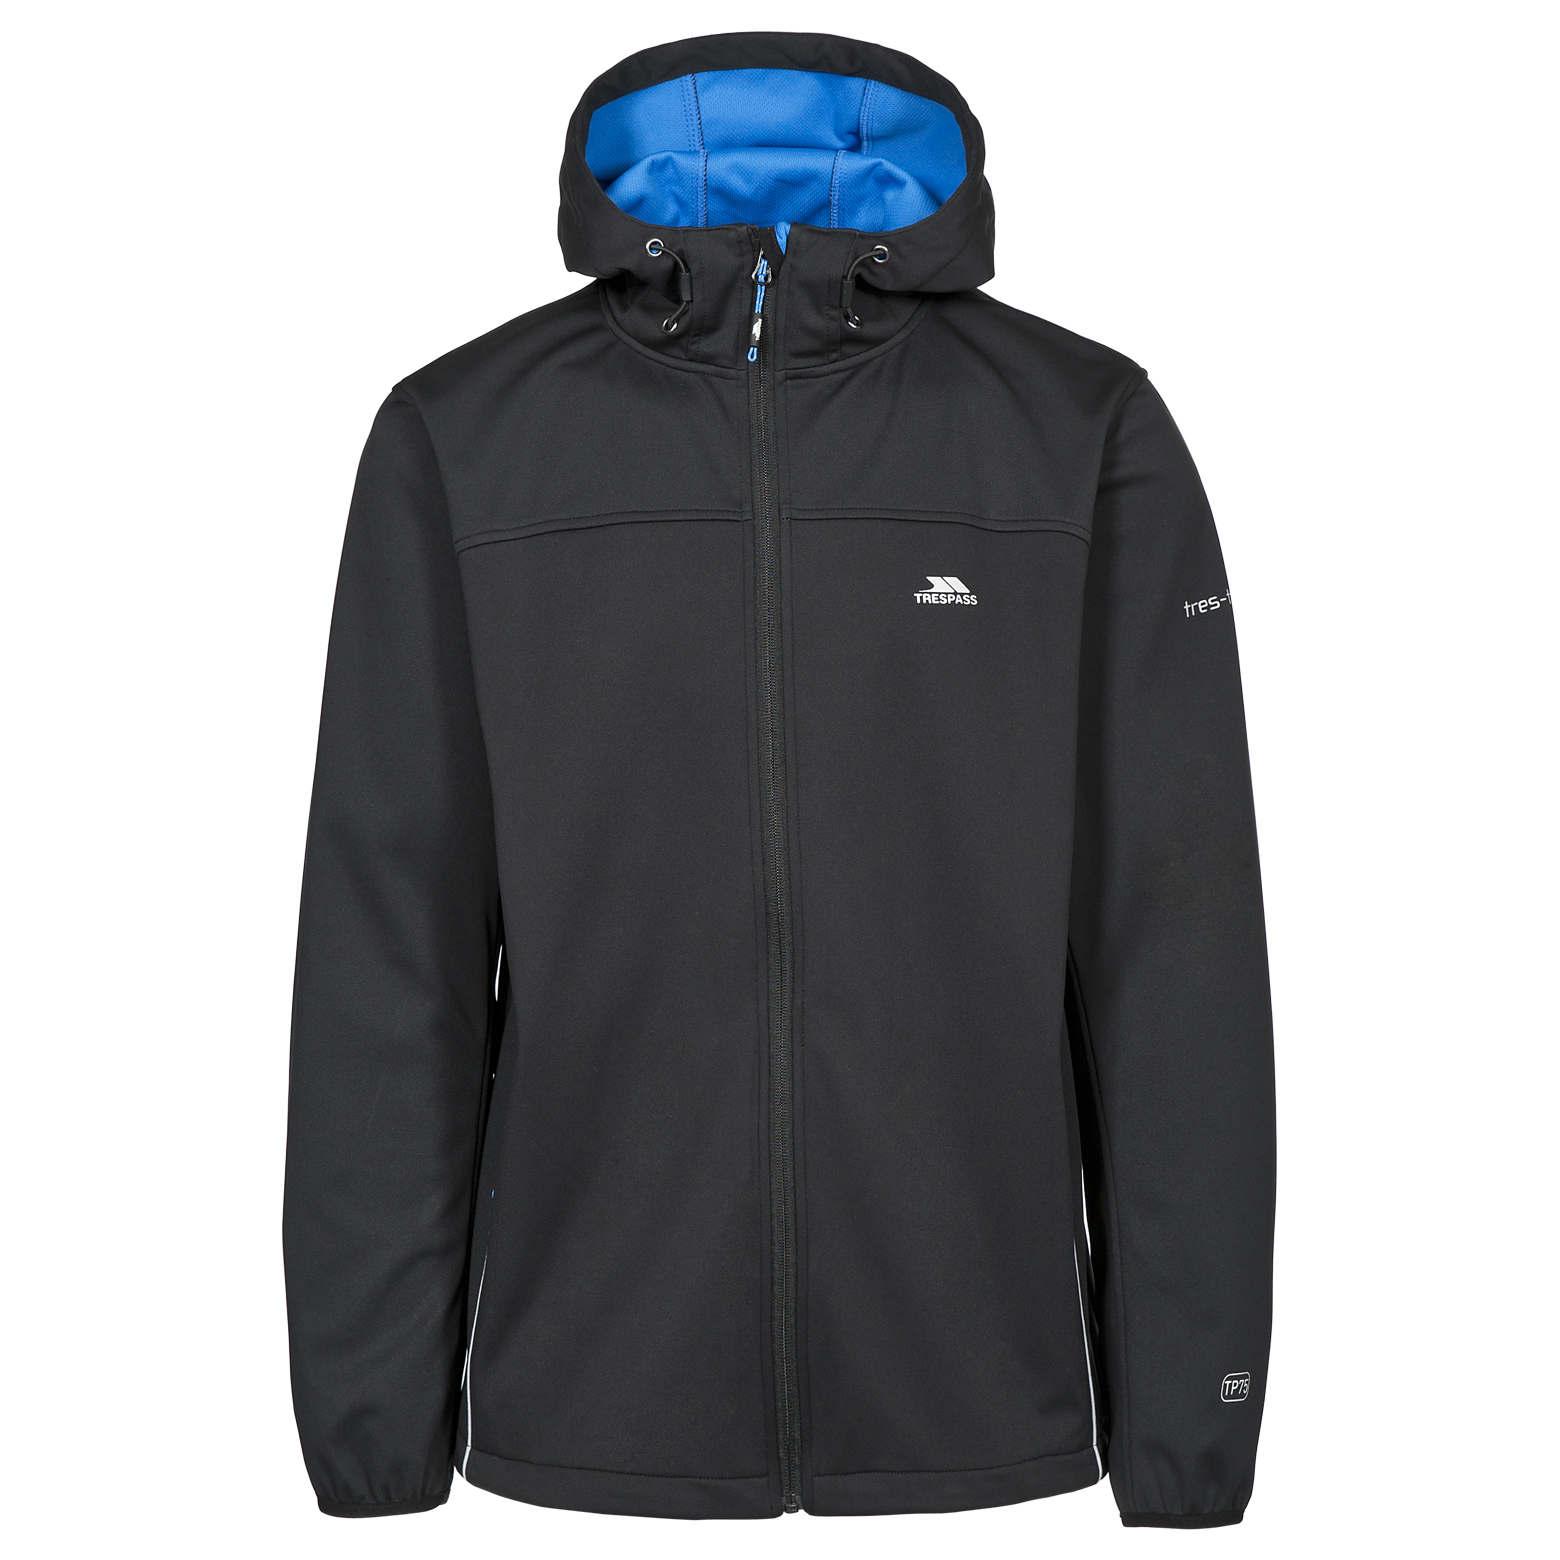 Trespass-Zeek-Para-Hombre-Impermeable-Transpirable-Abrigo-chaqueta-de-cascara-suave-con-capucha miniatura 16